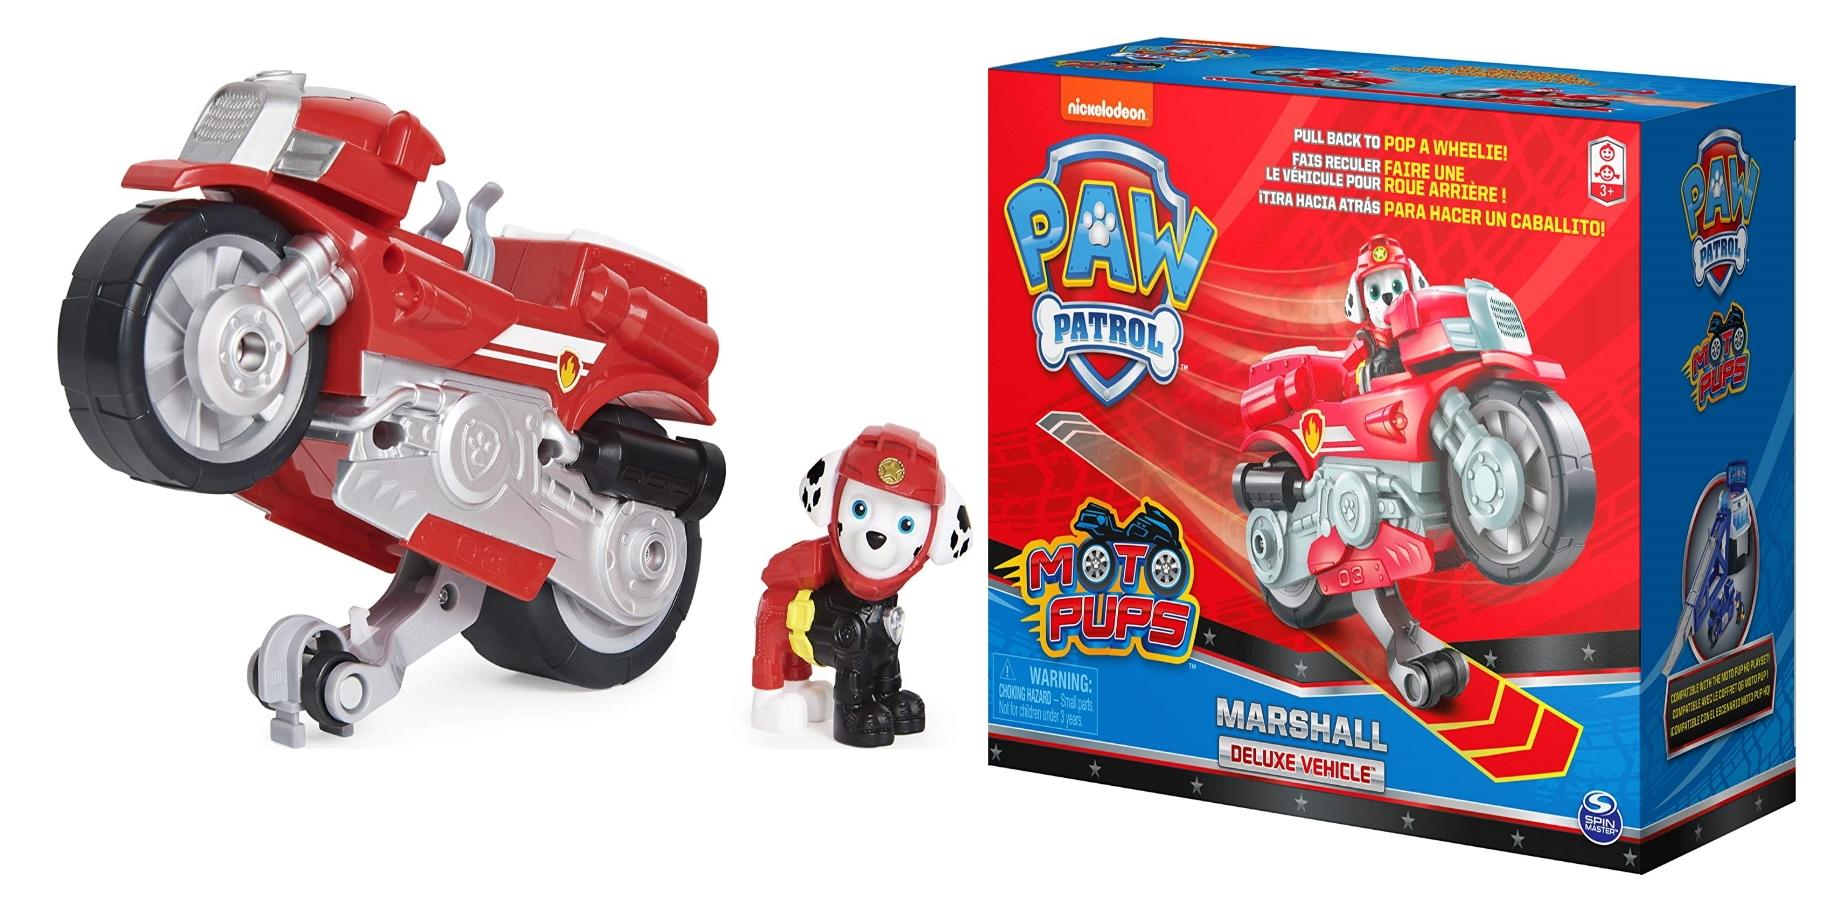 PSI PATROL MARSHALL FIGURKA I MOTOCYKL MOTO PUPS